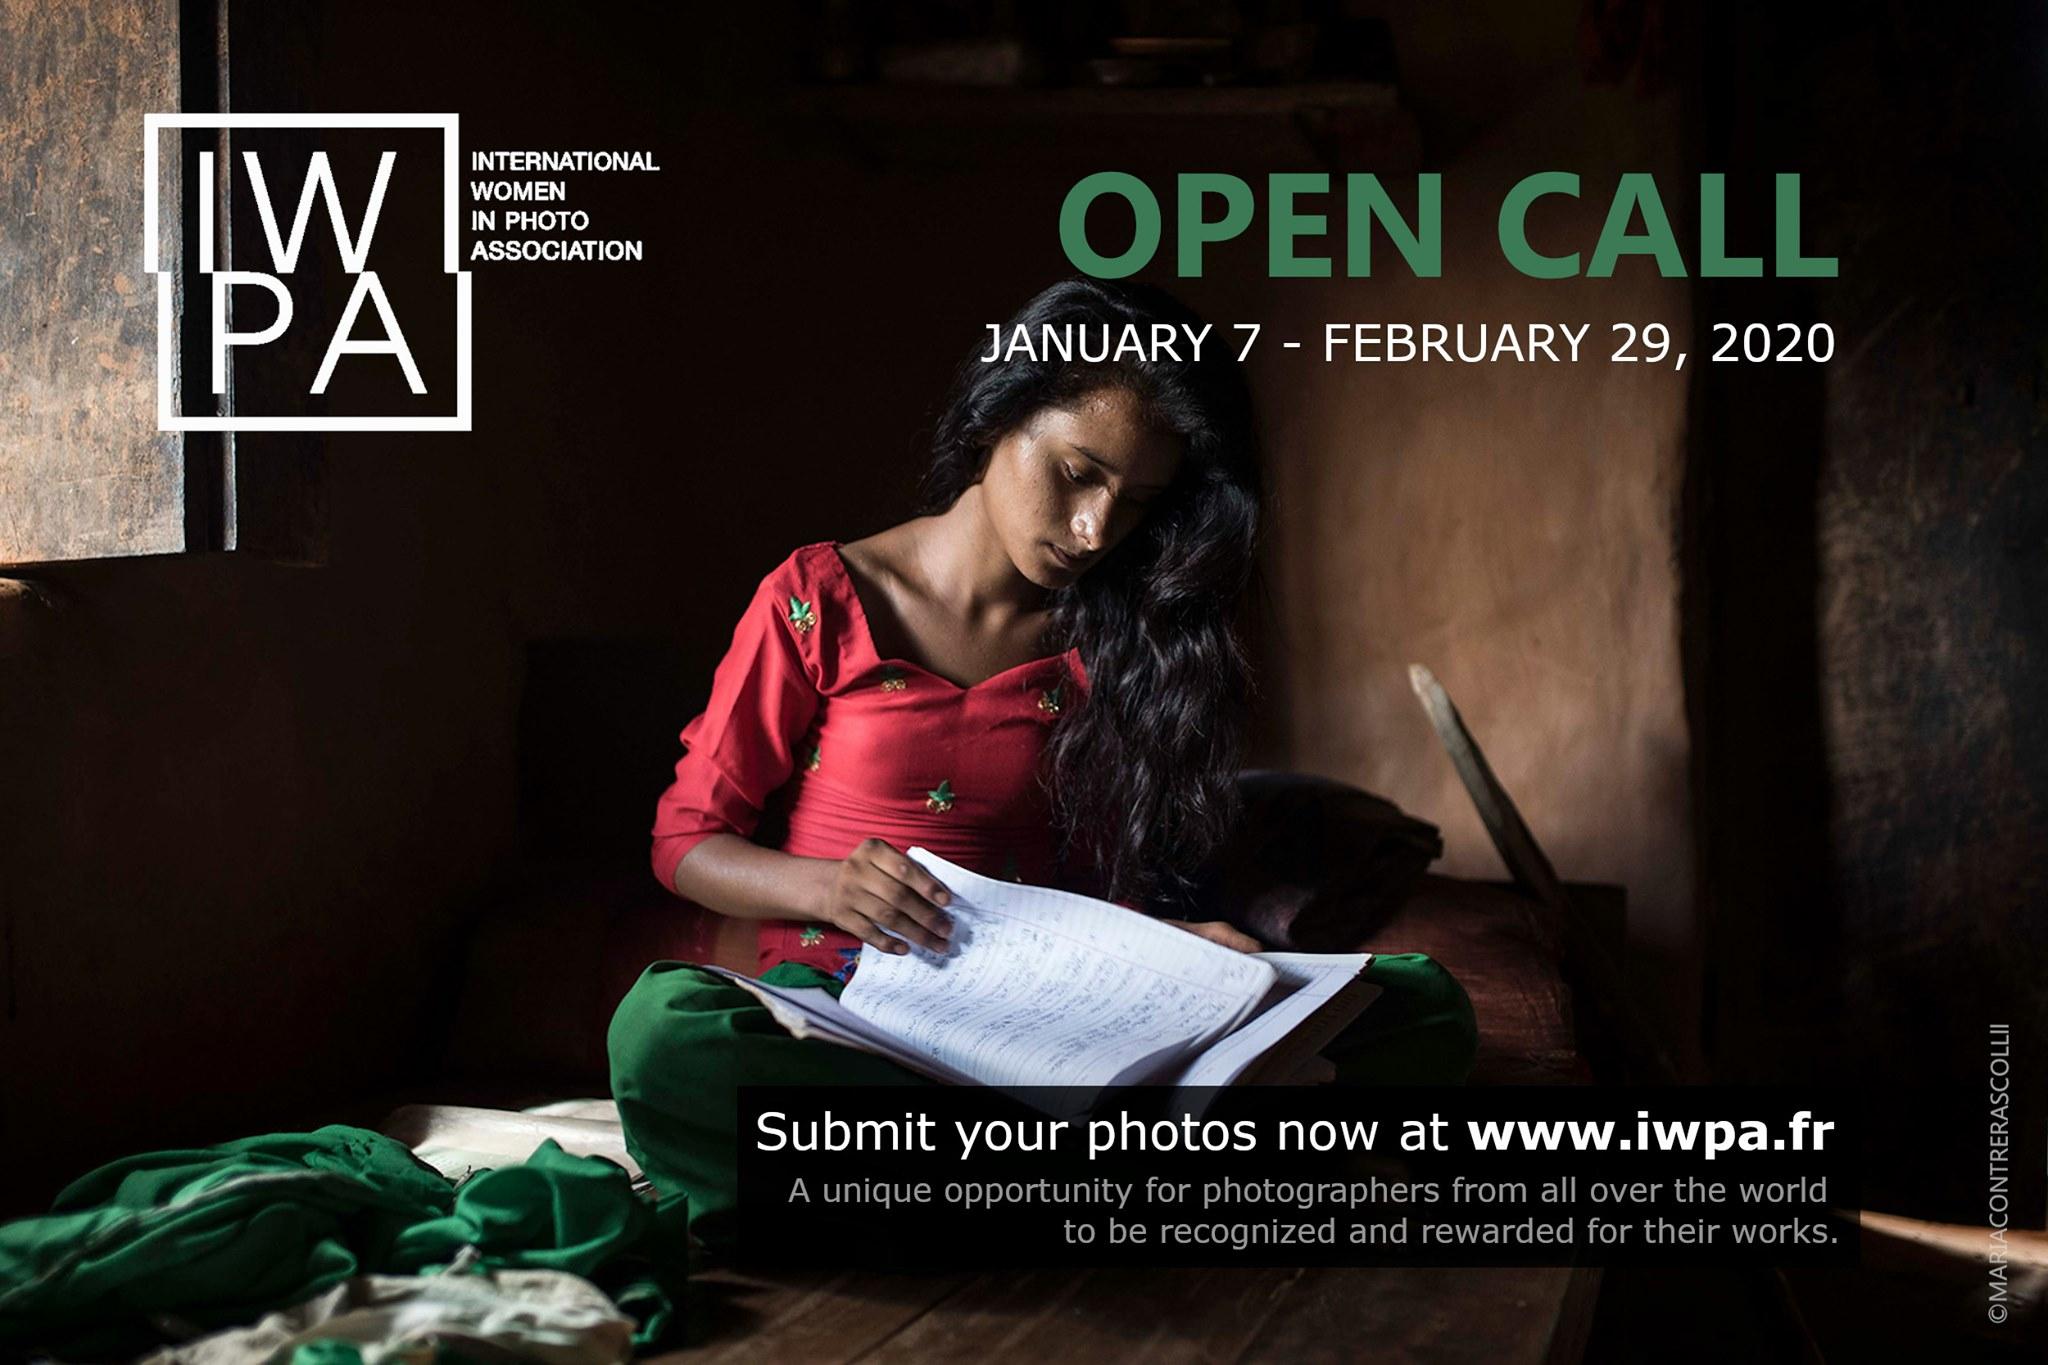 Iwpa International Women Photographers Award Open Call 2020 Asef Culture360